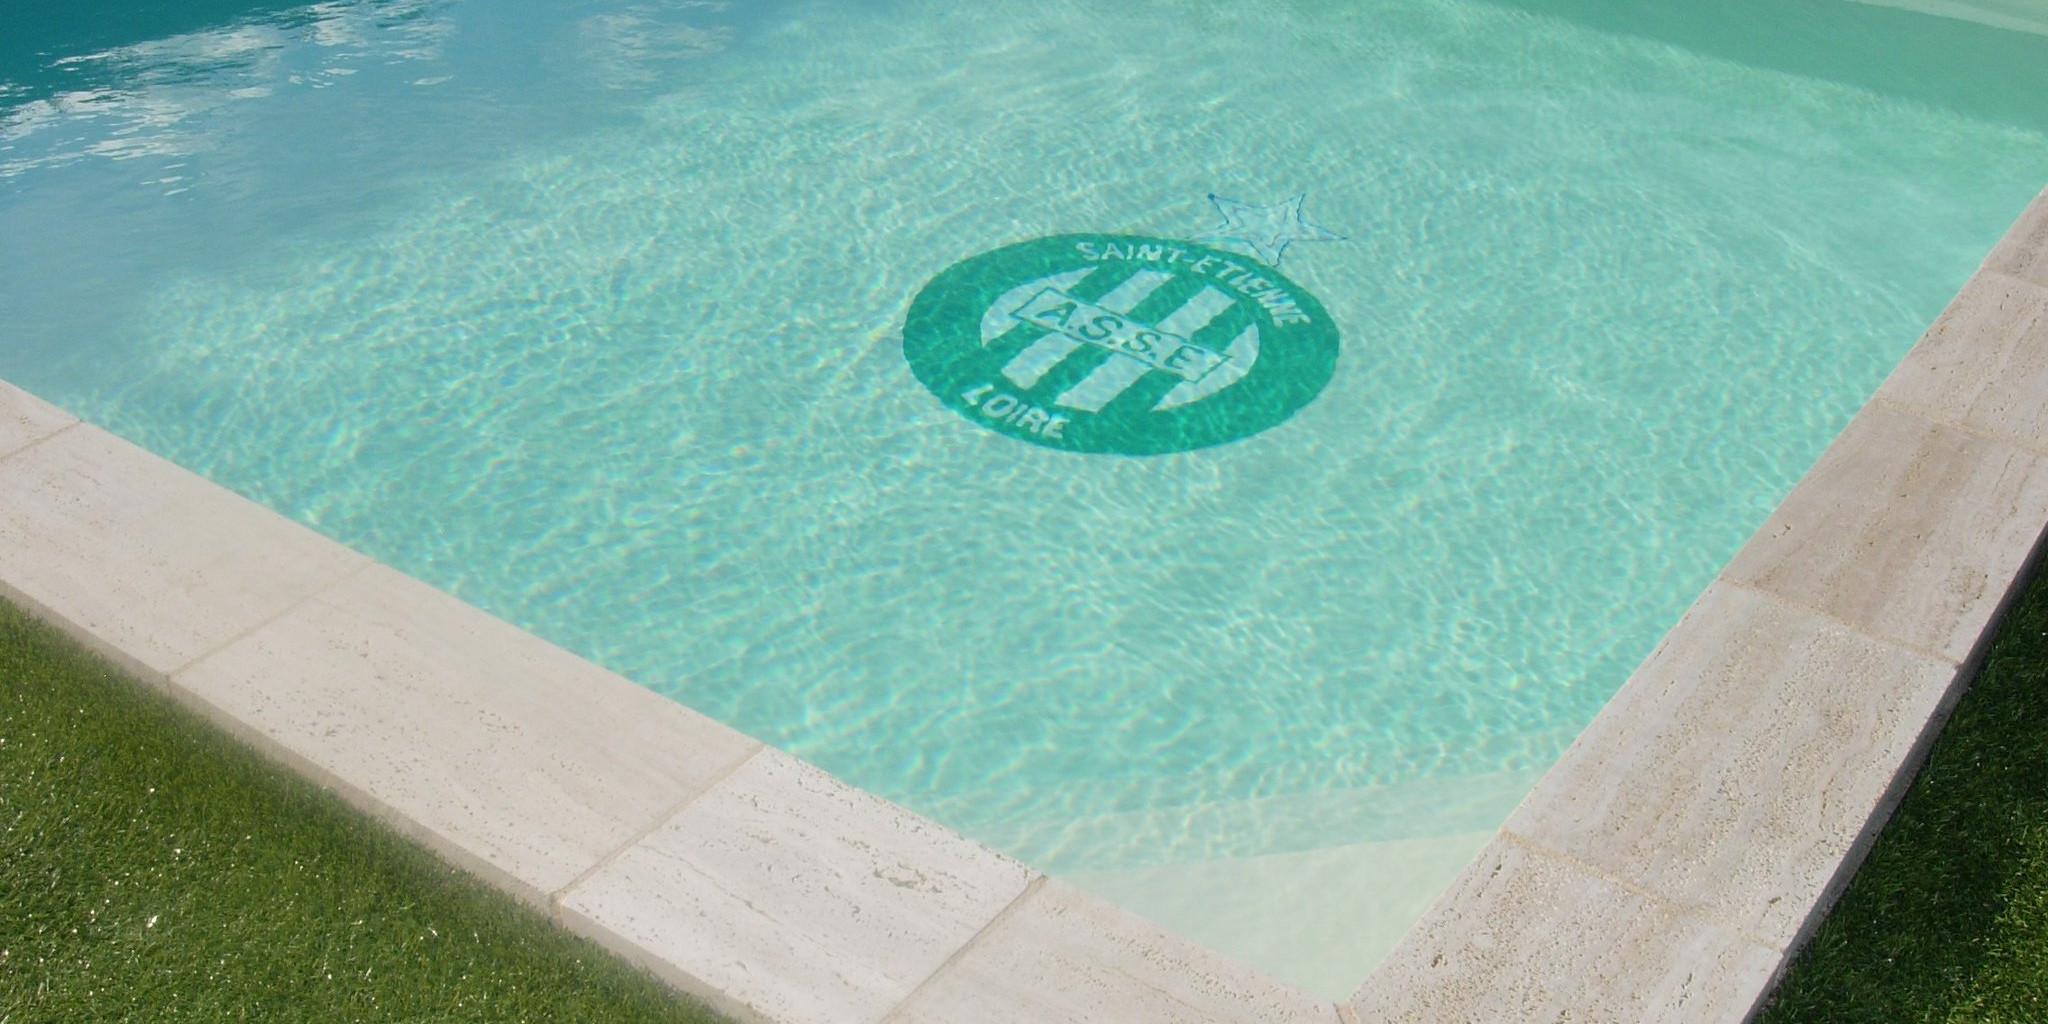 Saint etienne supporter des verts jusqu 39 au fond de sa piscine radio scoop - Piscine carrelage blanc saint etienne ...